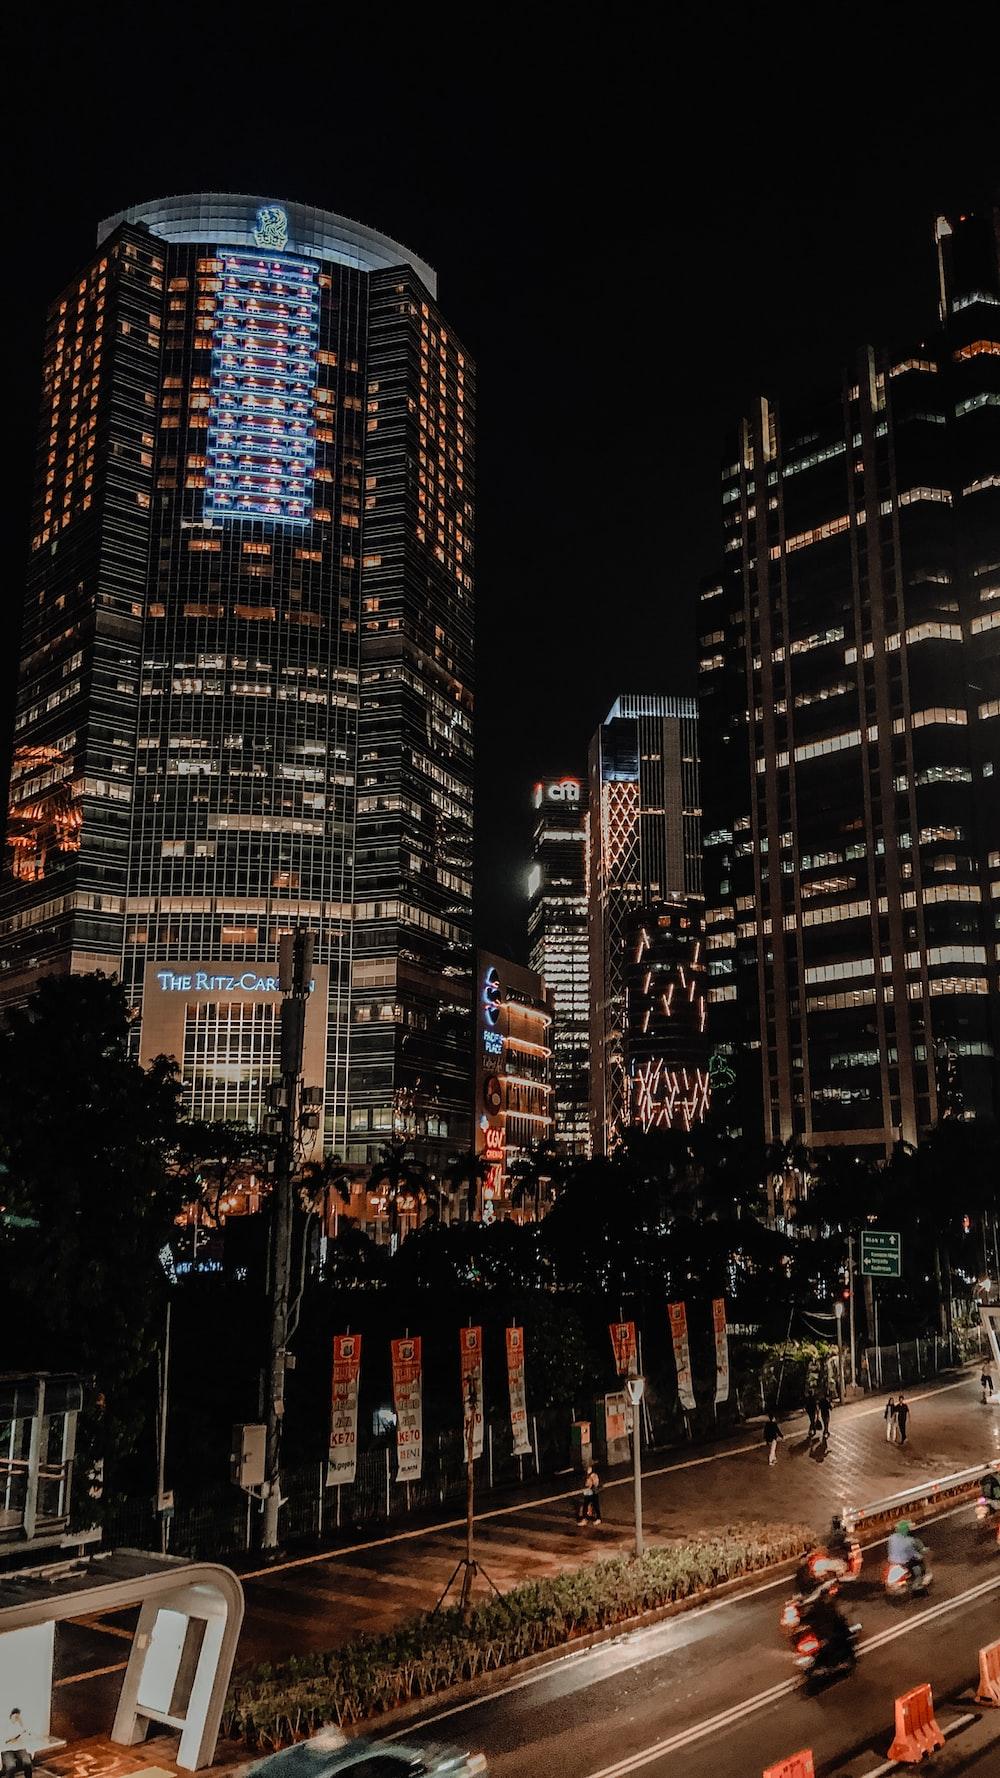 20+ Jakarta Pictures   Download Free Images on Unsplash